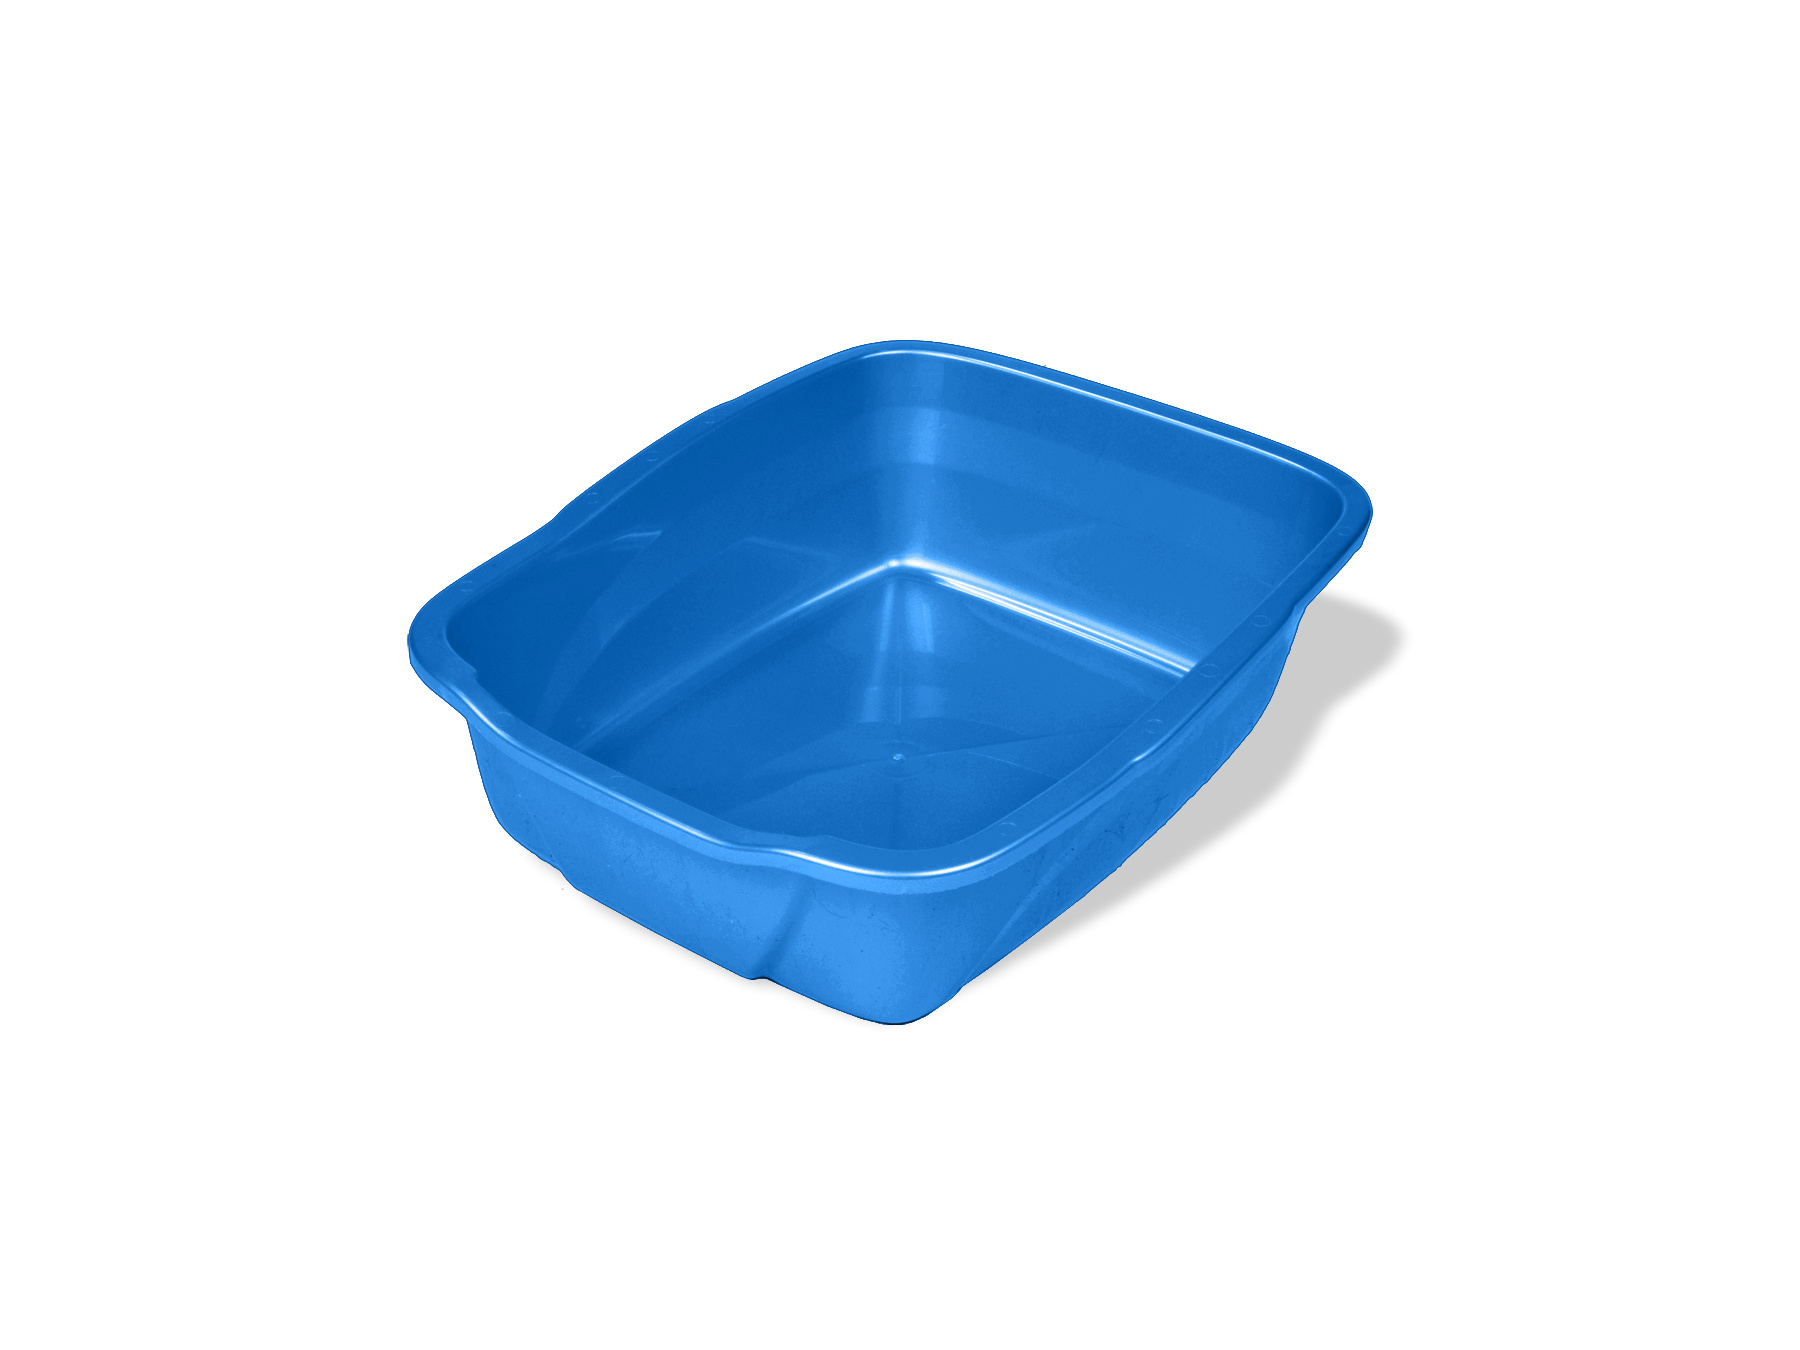 VANNESS Van Ness Small Litter Pan Product Image